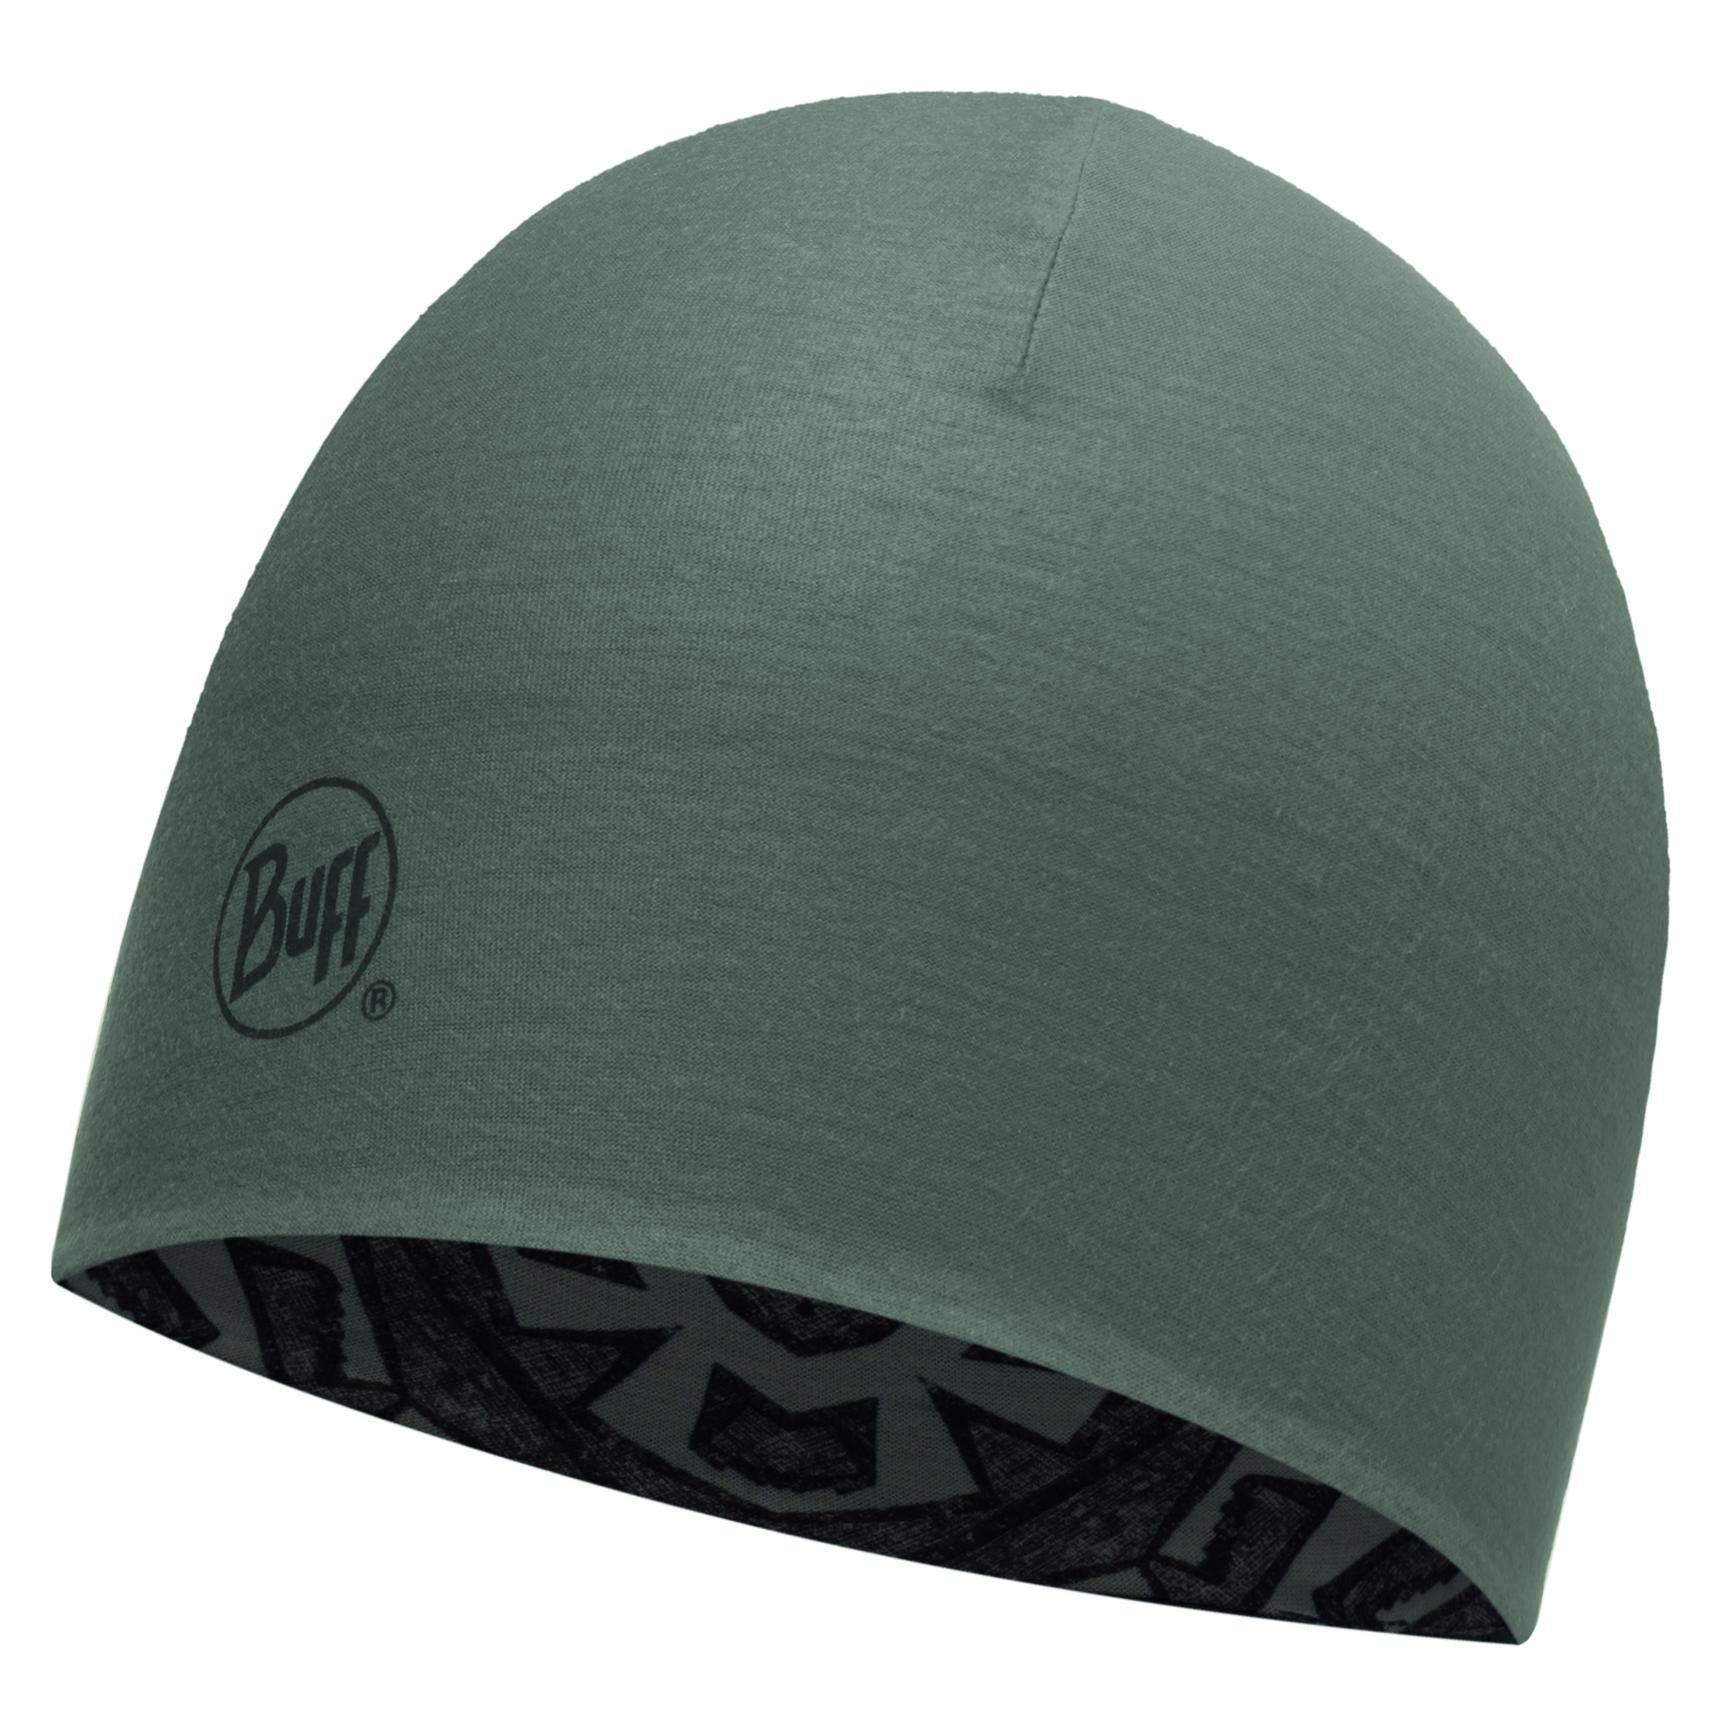 Купить Шапка BUFF Coolmax ZELIG MINERAL - GARGOYLE Банданы и шарфы Buff ® 1266867